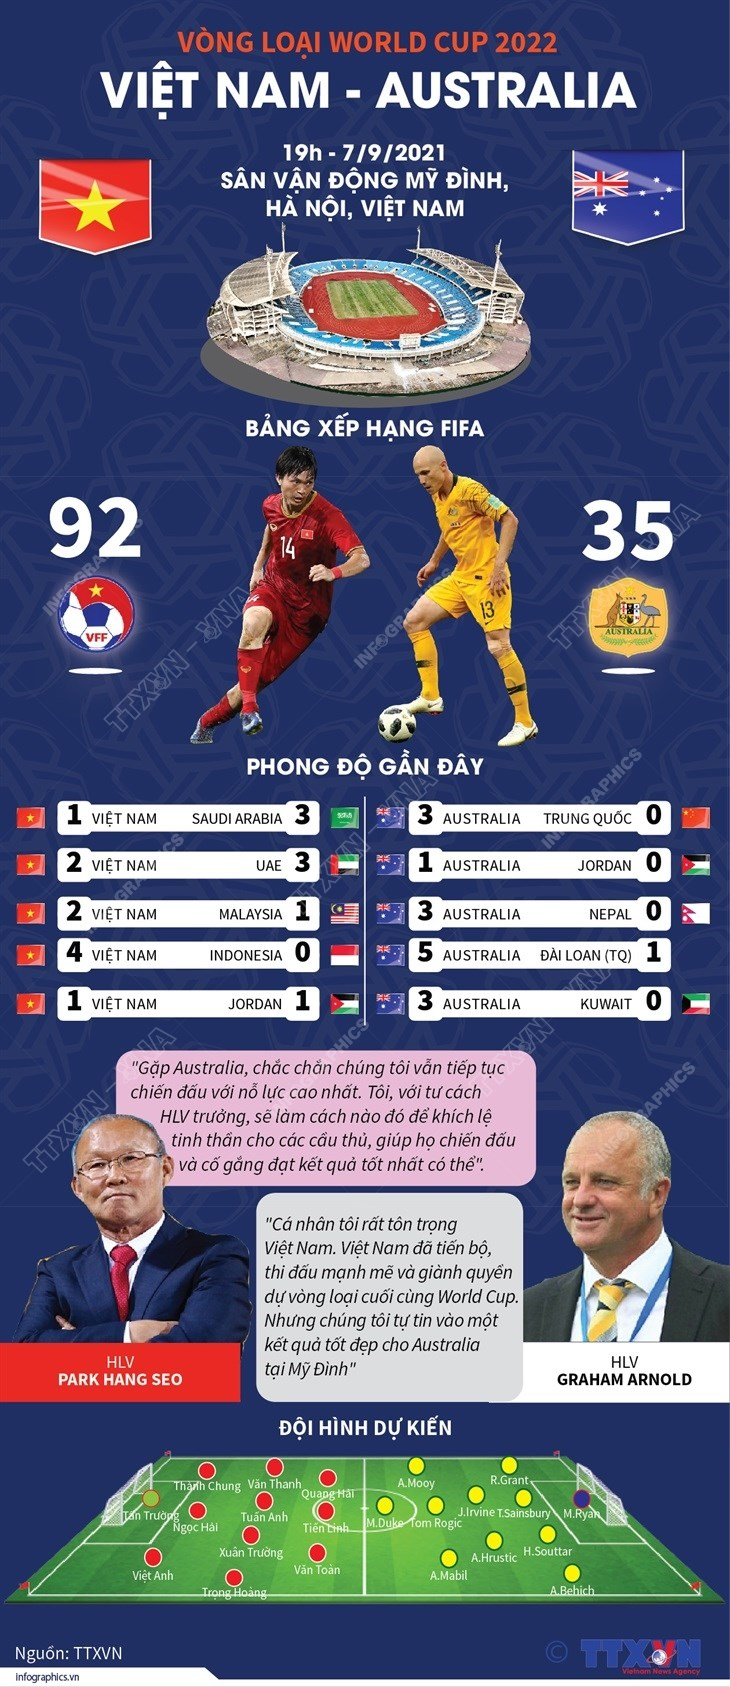 Thong tin truoc tran Viet Nam-Australia tai vong loai World Cup 2022 hinh anh 1